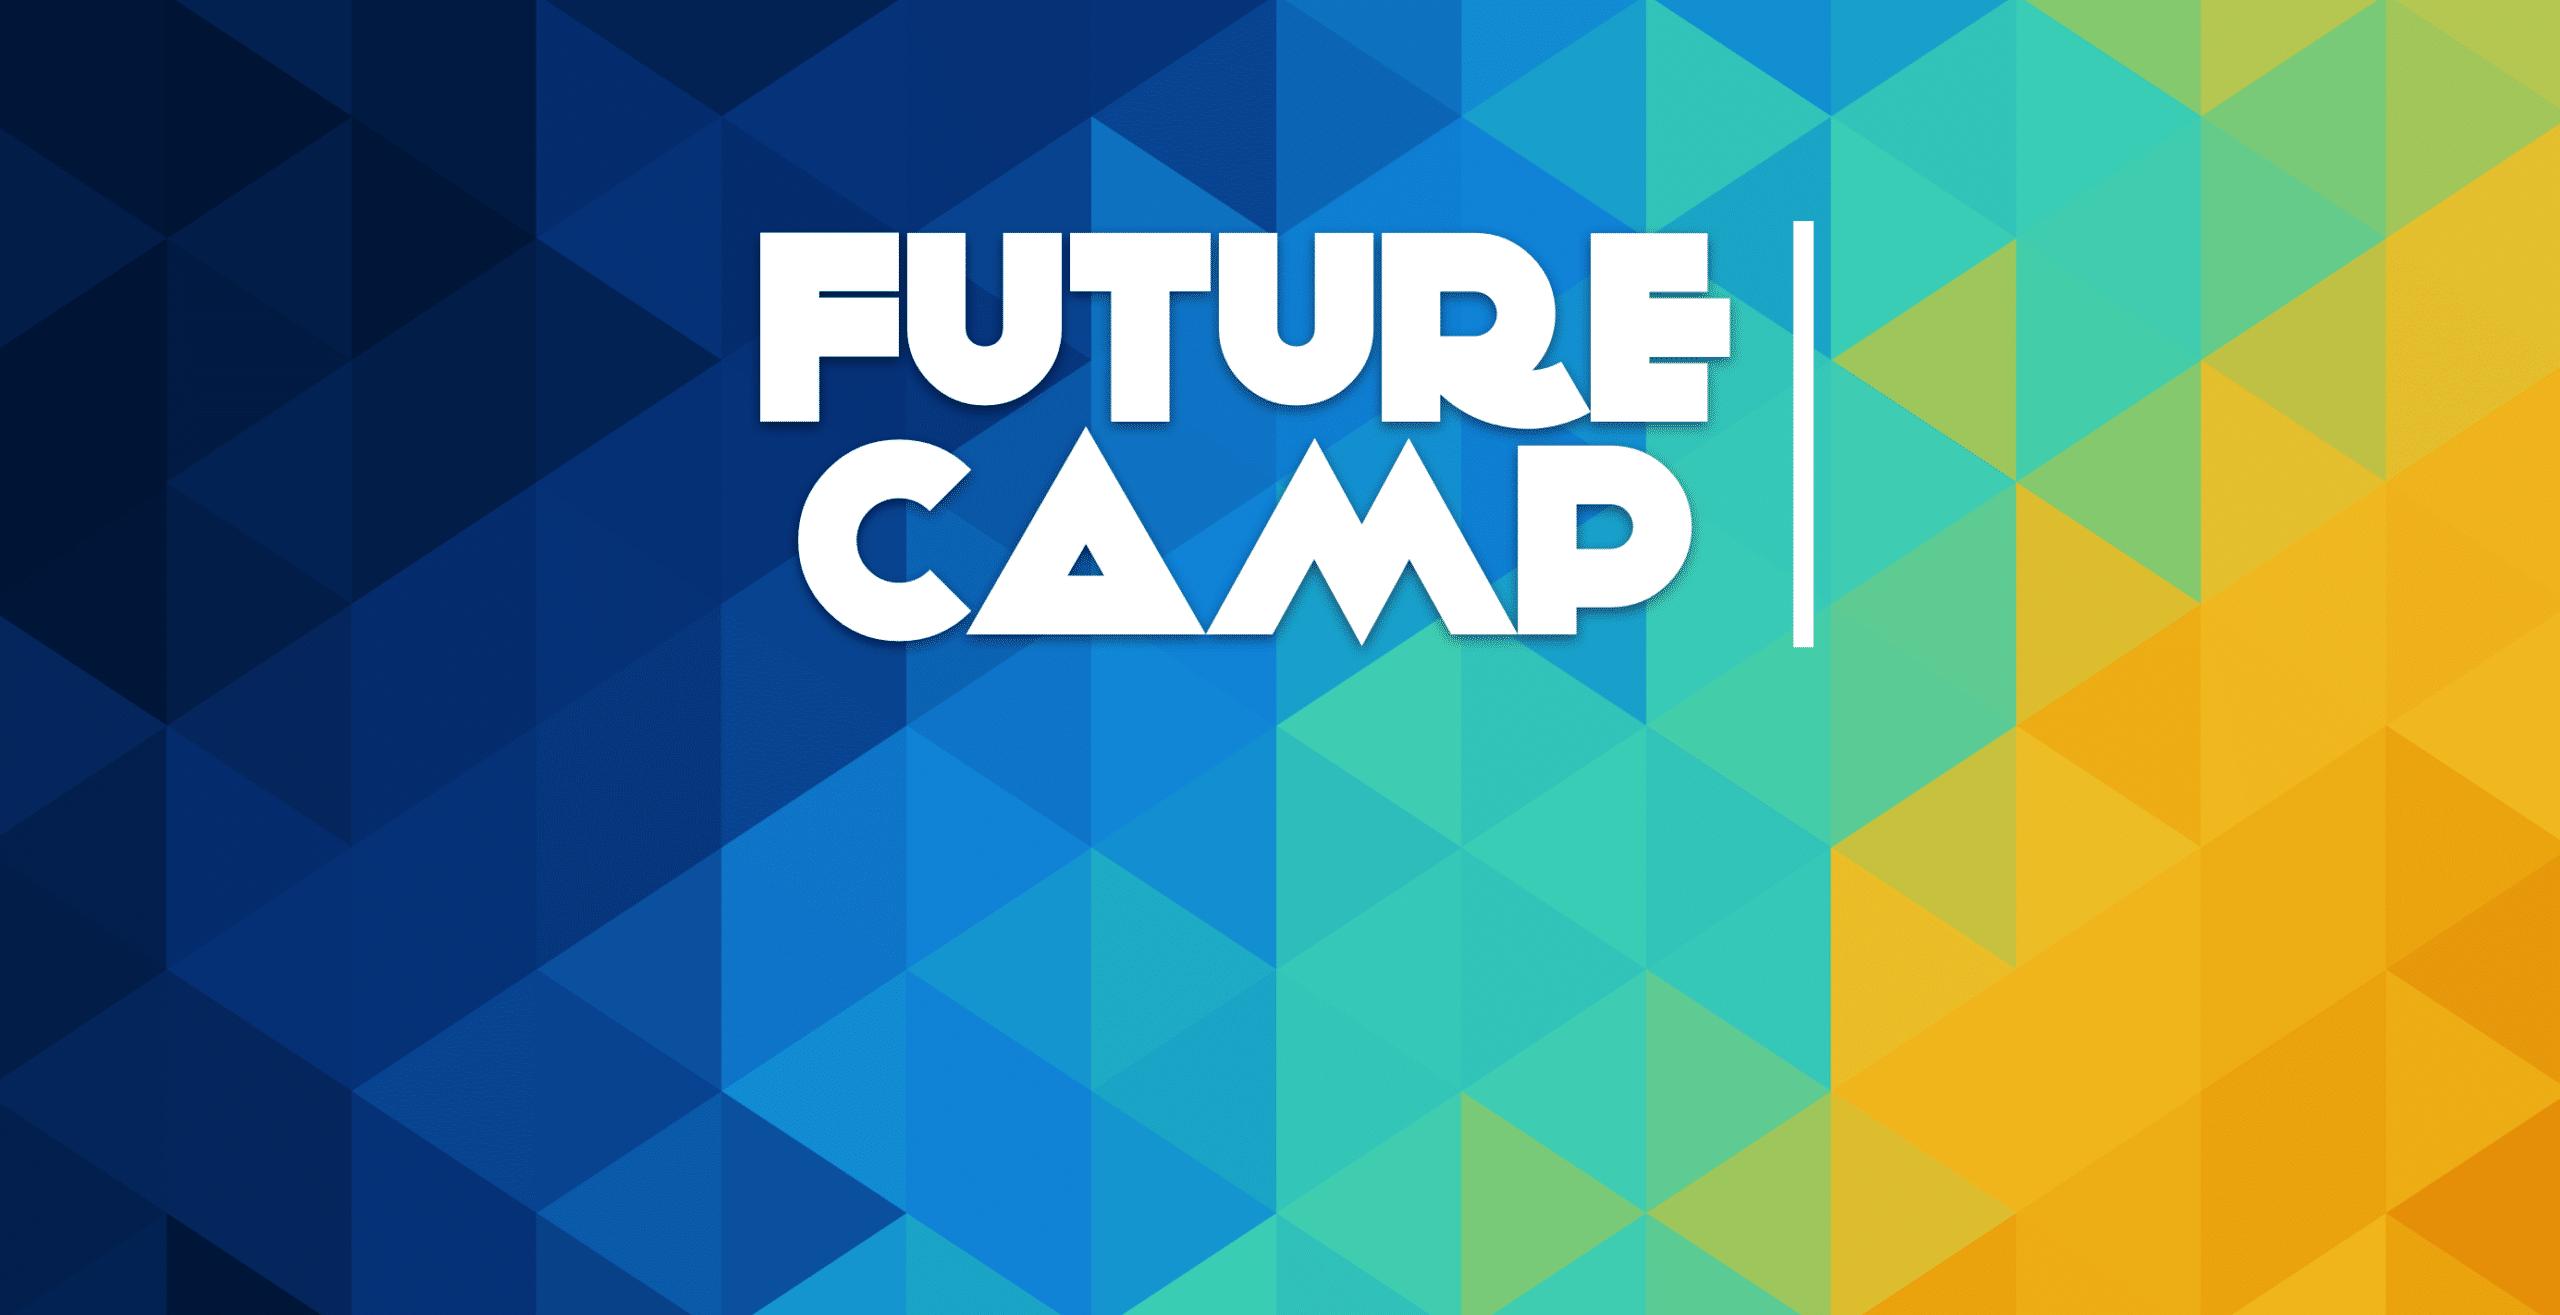 Download the FUTURE CAMP Organizer's Guide 1.0